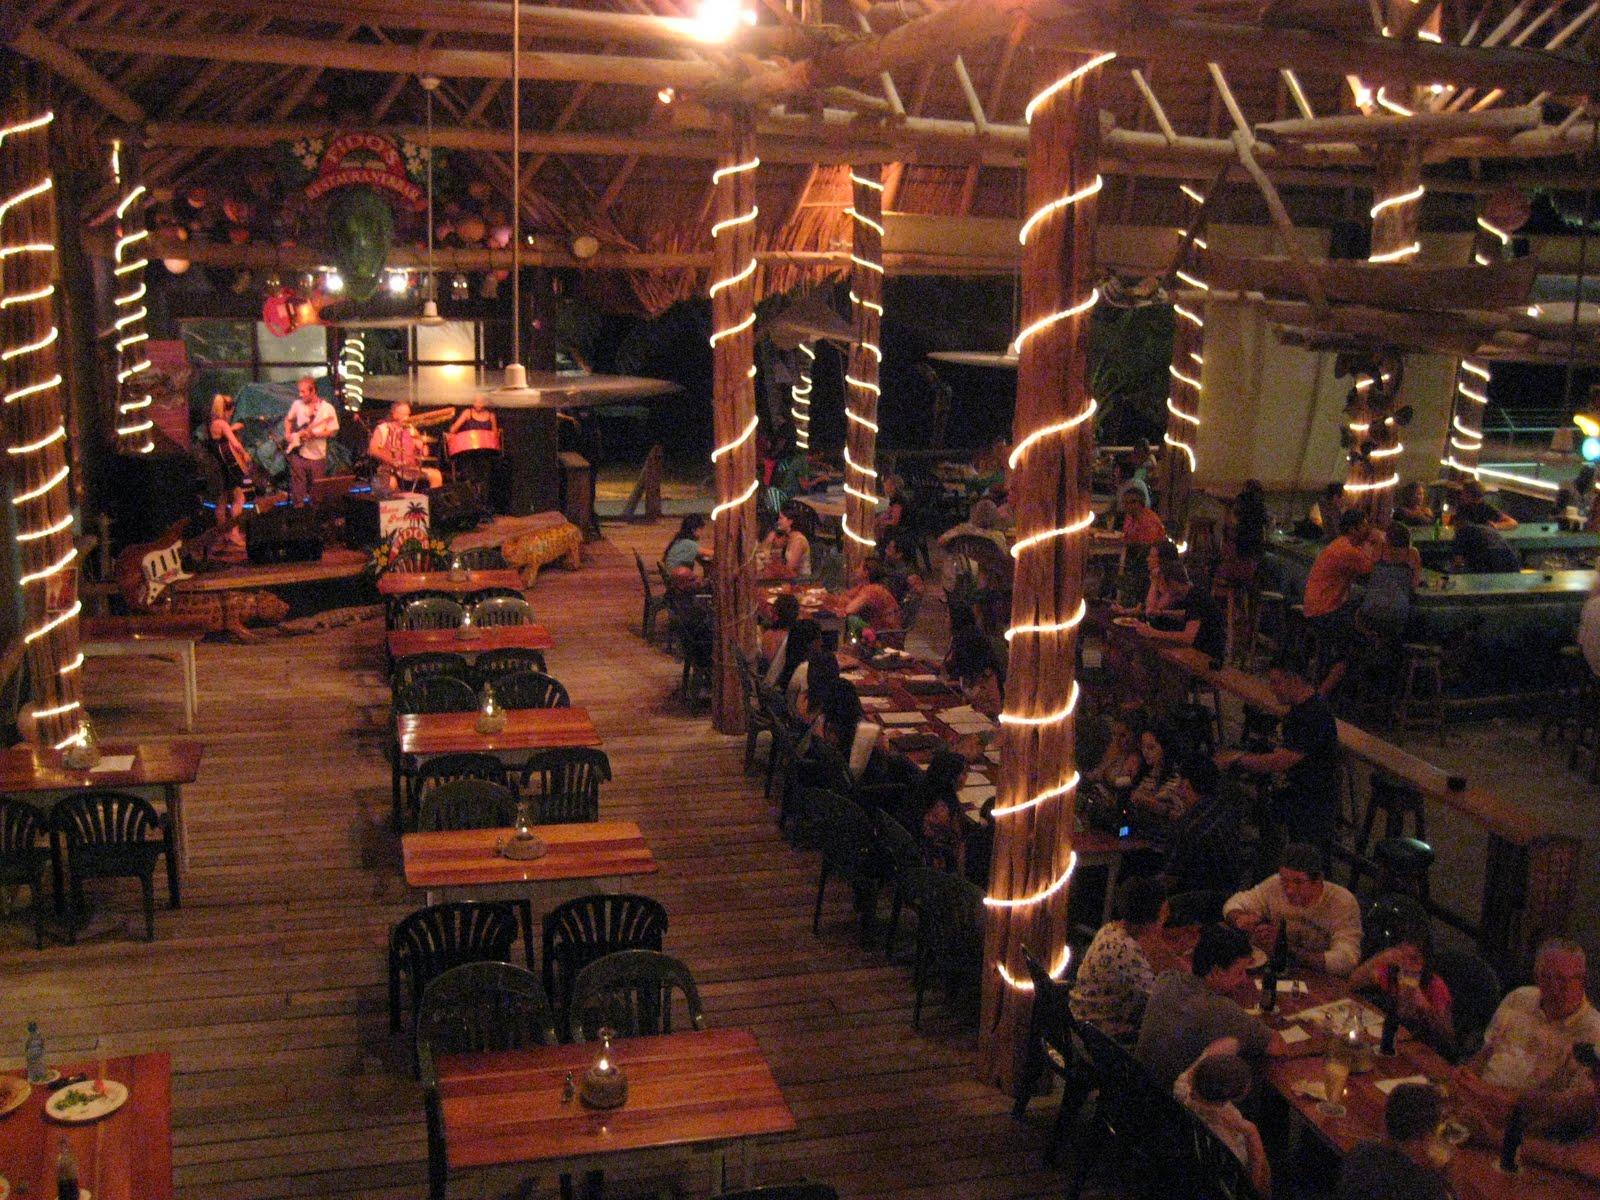 15 best Ambergris Caye, Belize images on Pinterest ...  |Fidos San Pedro Belize